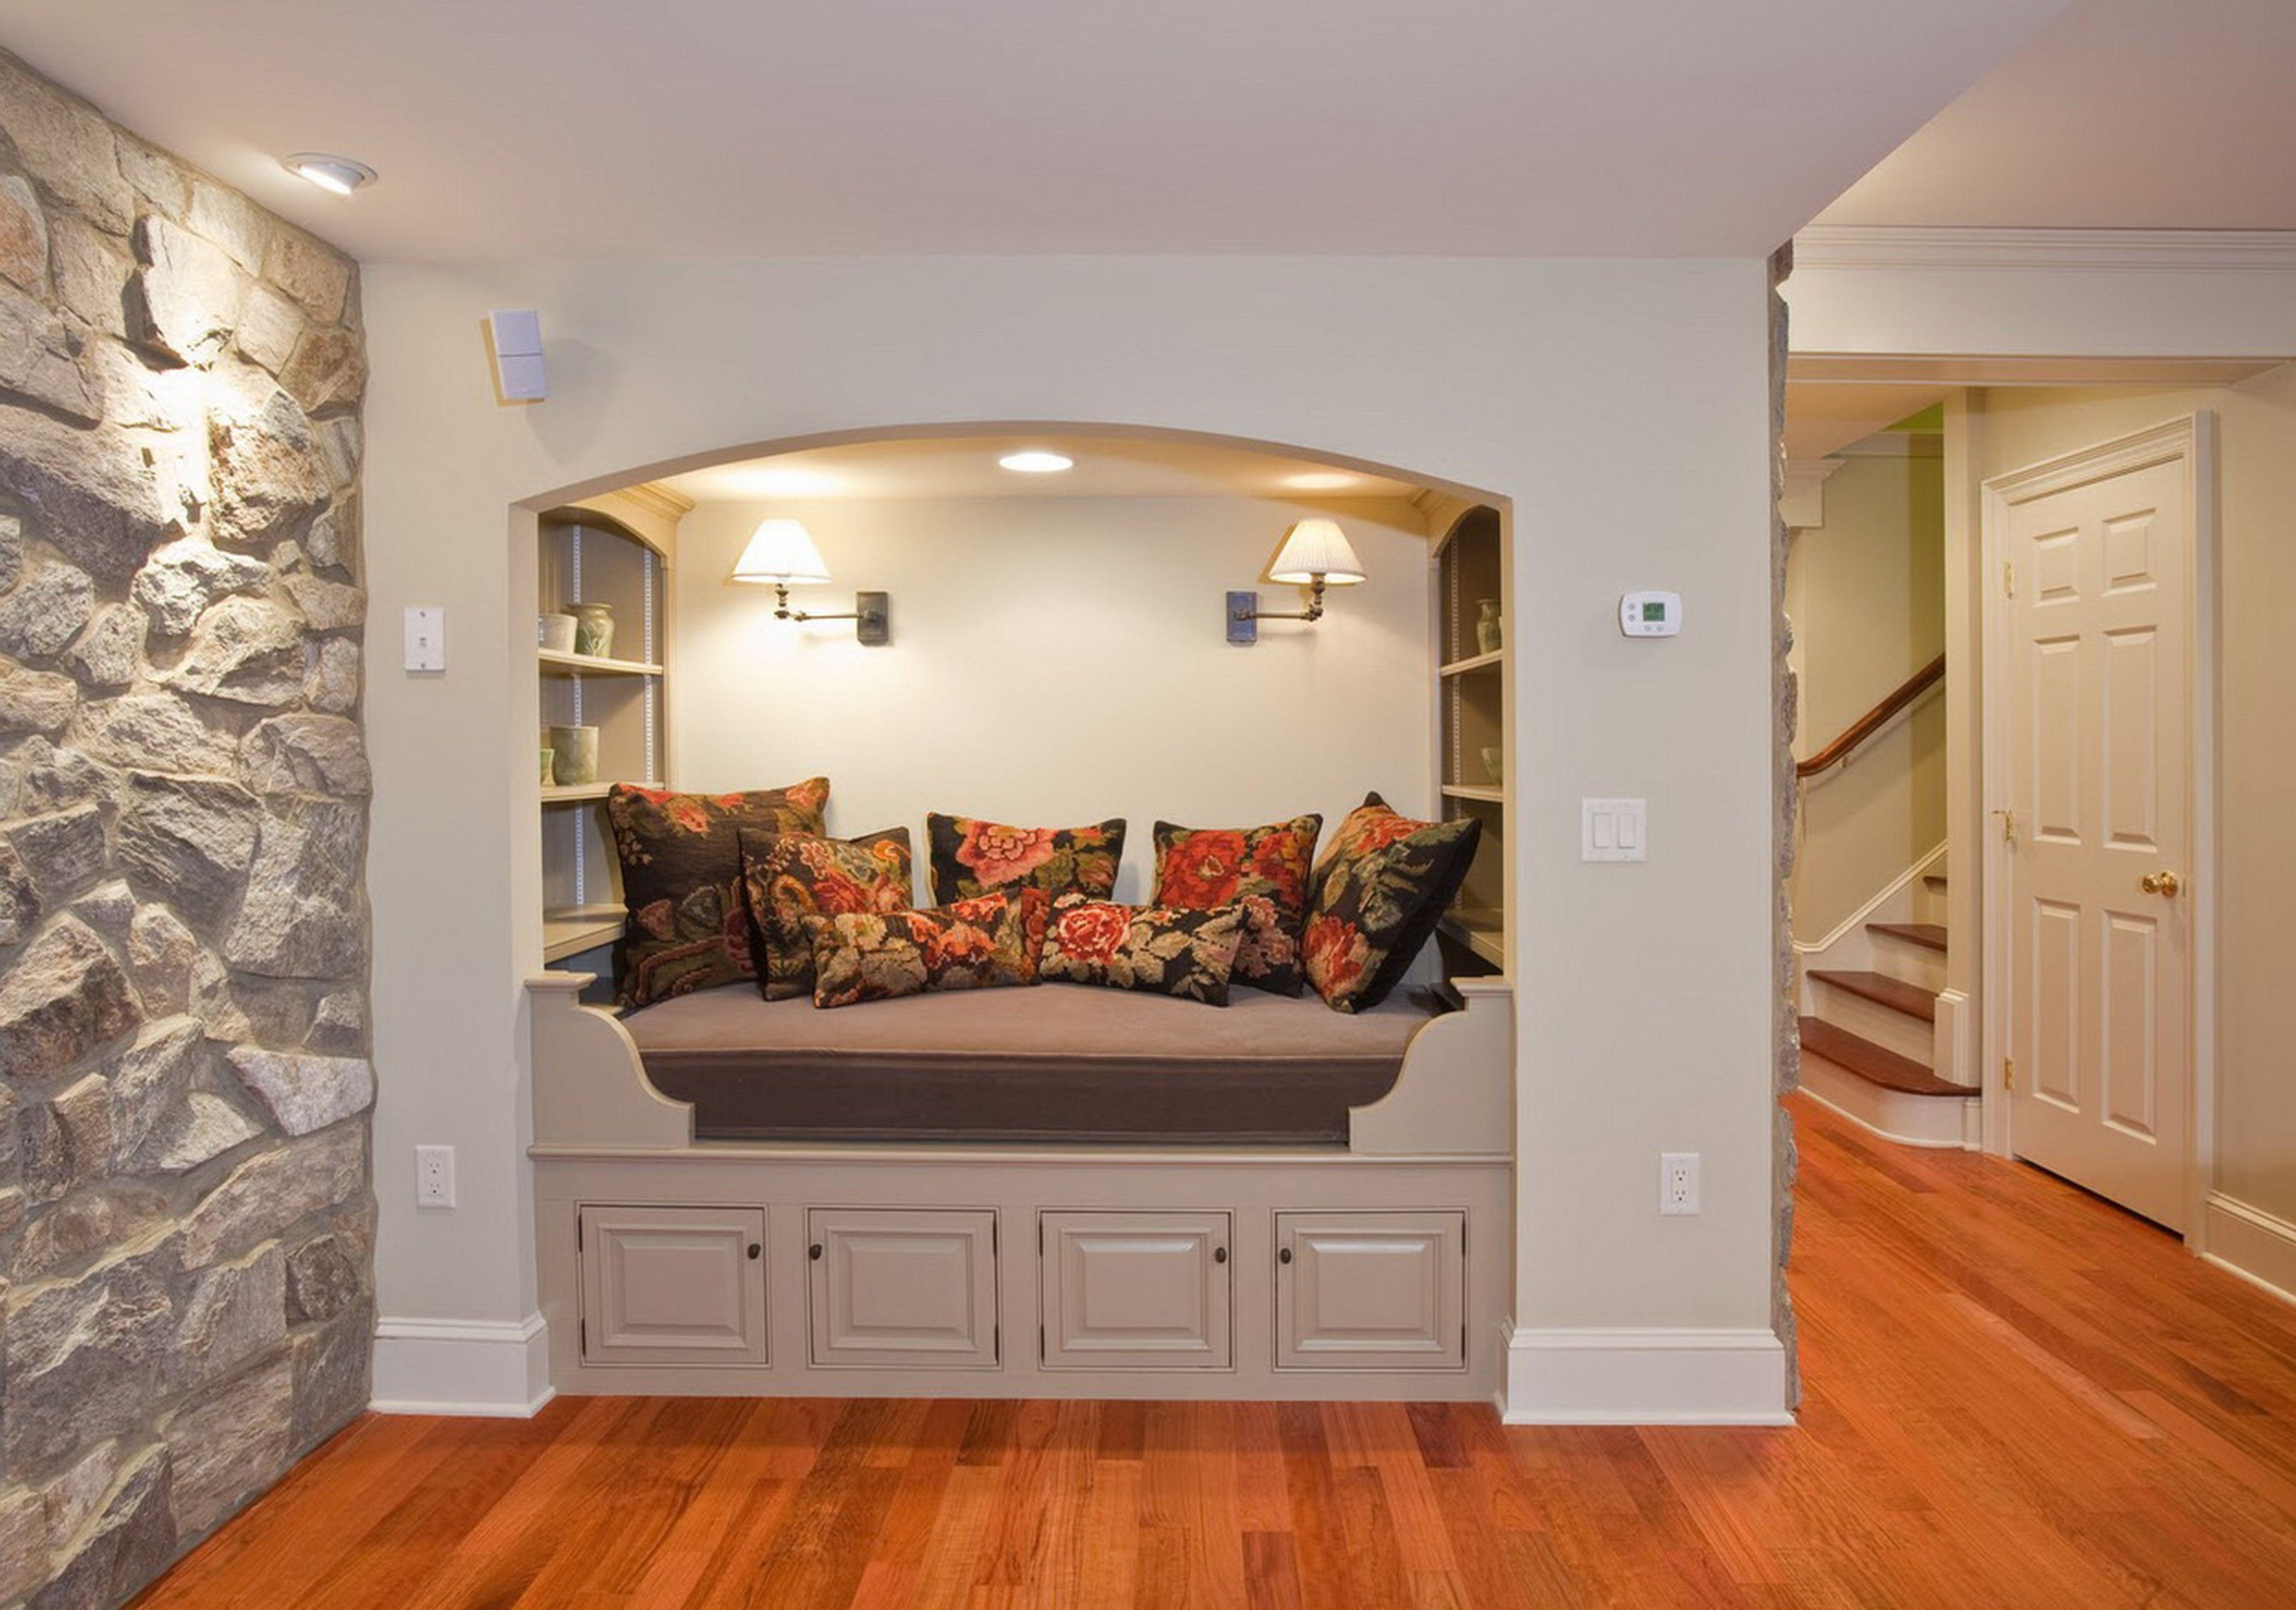 Basement Renovation Ideas Interior model home play room |  playroom ideas awesome interior design